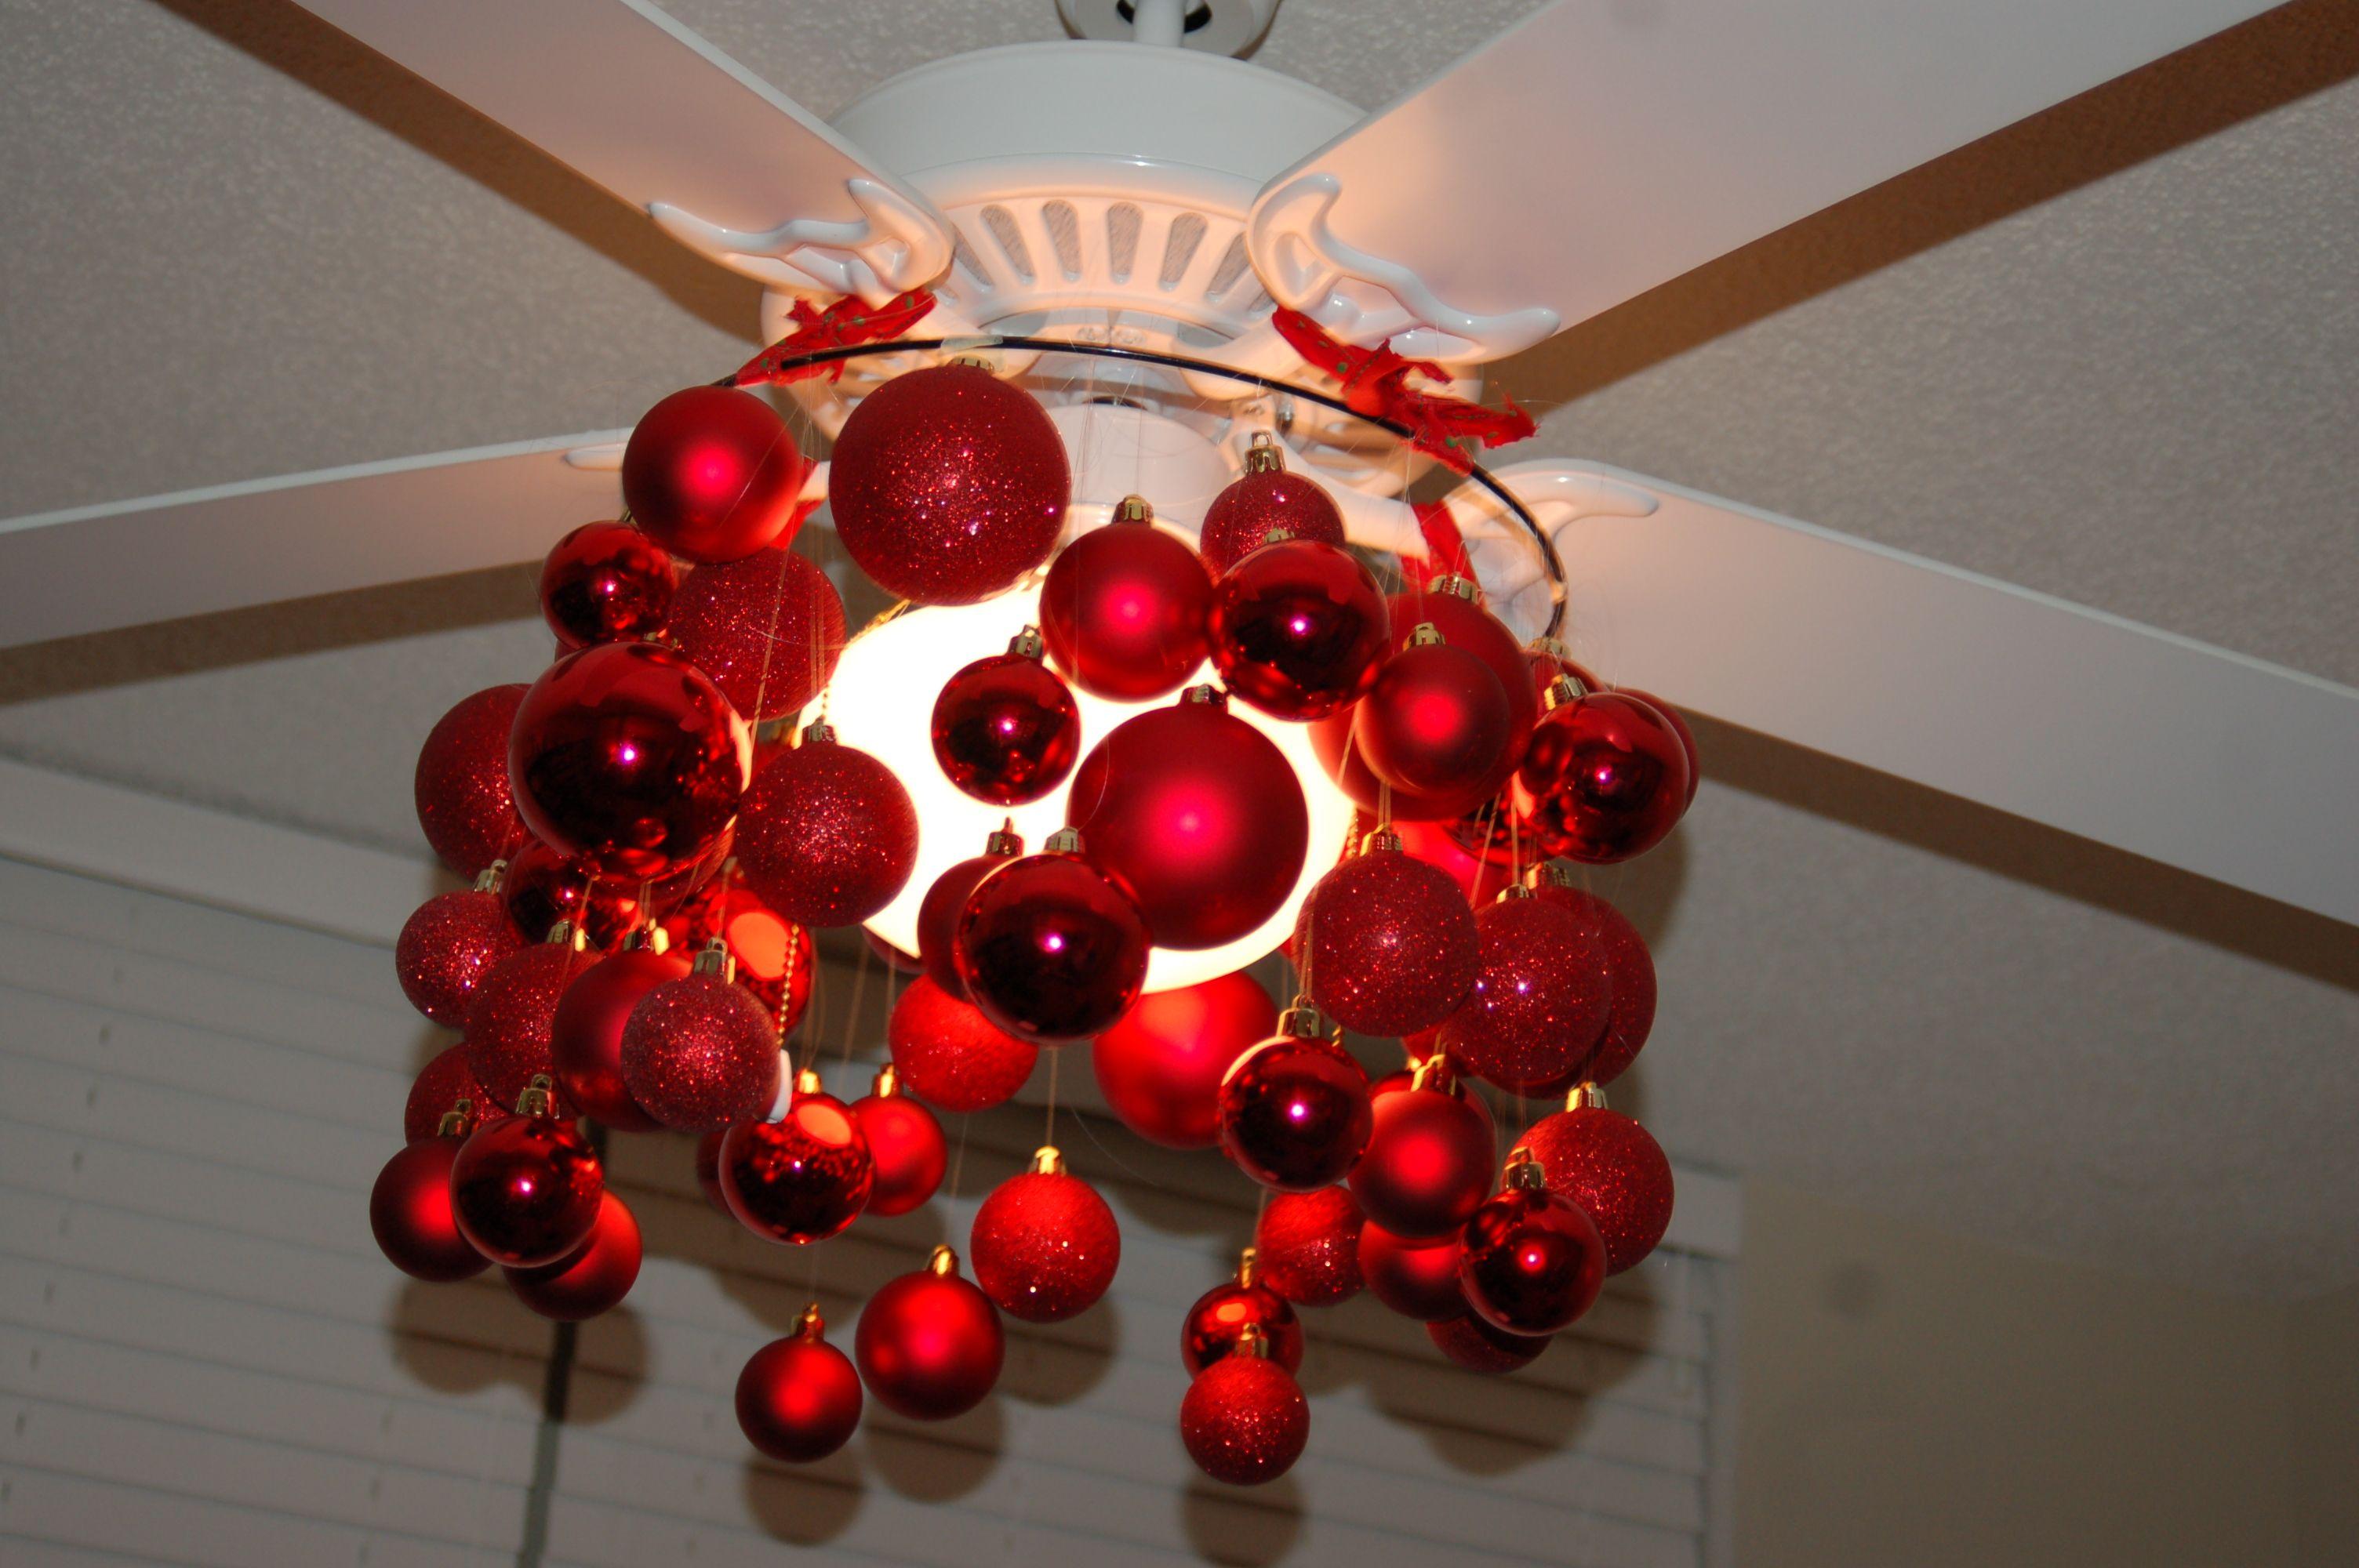 Ceiling Fan Chandelier Fail Christmas Decor Trends Black